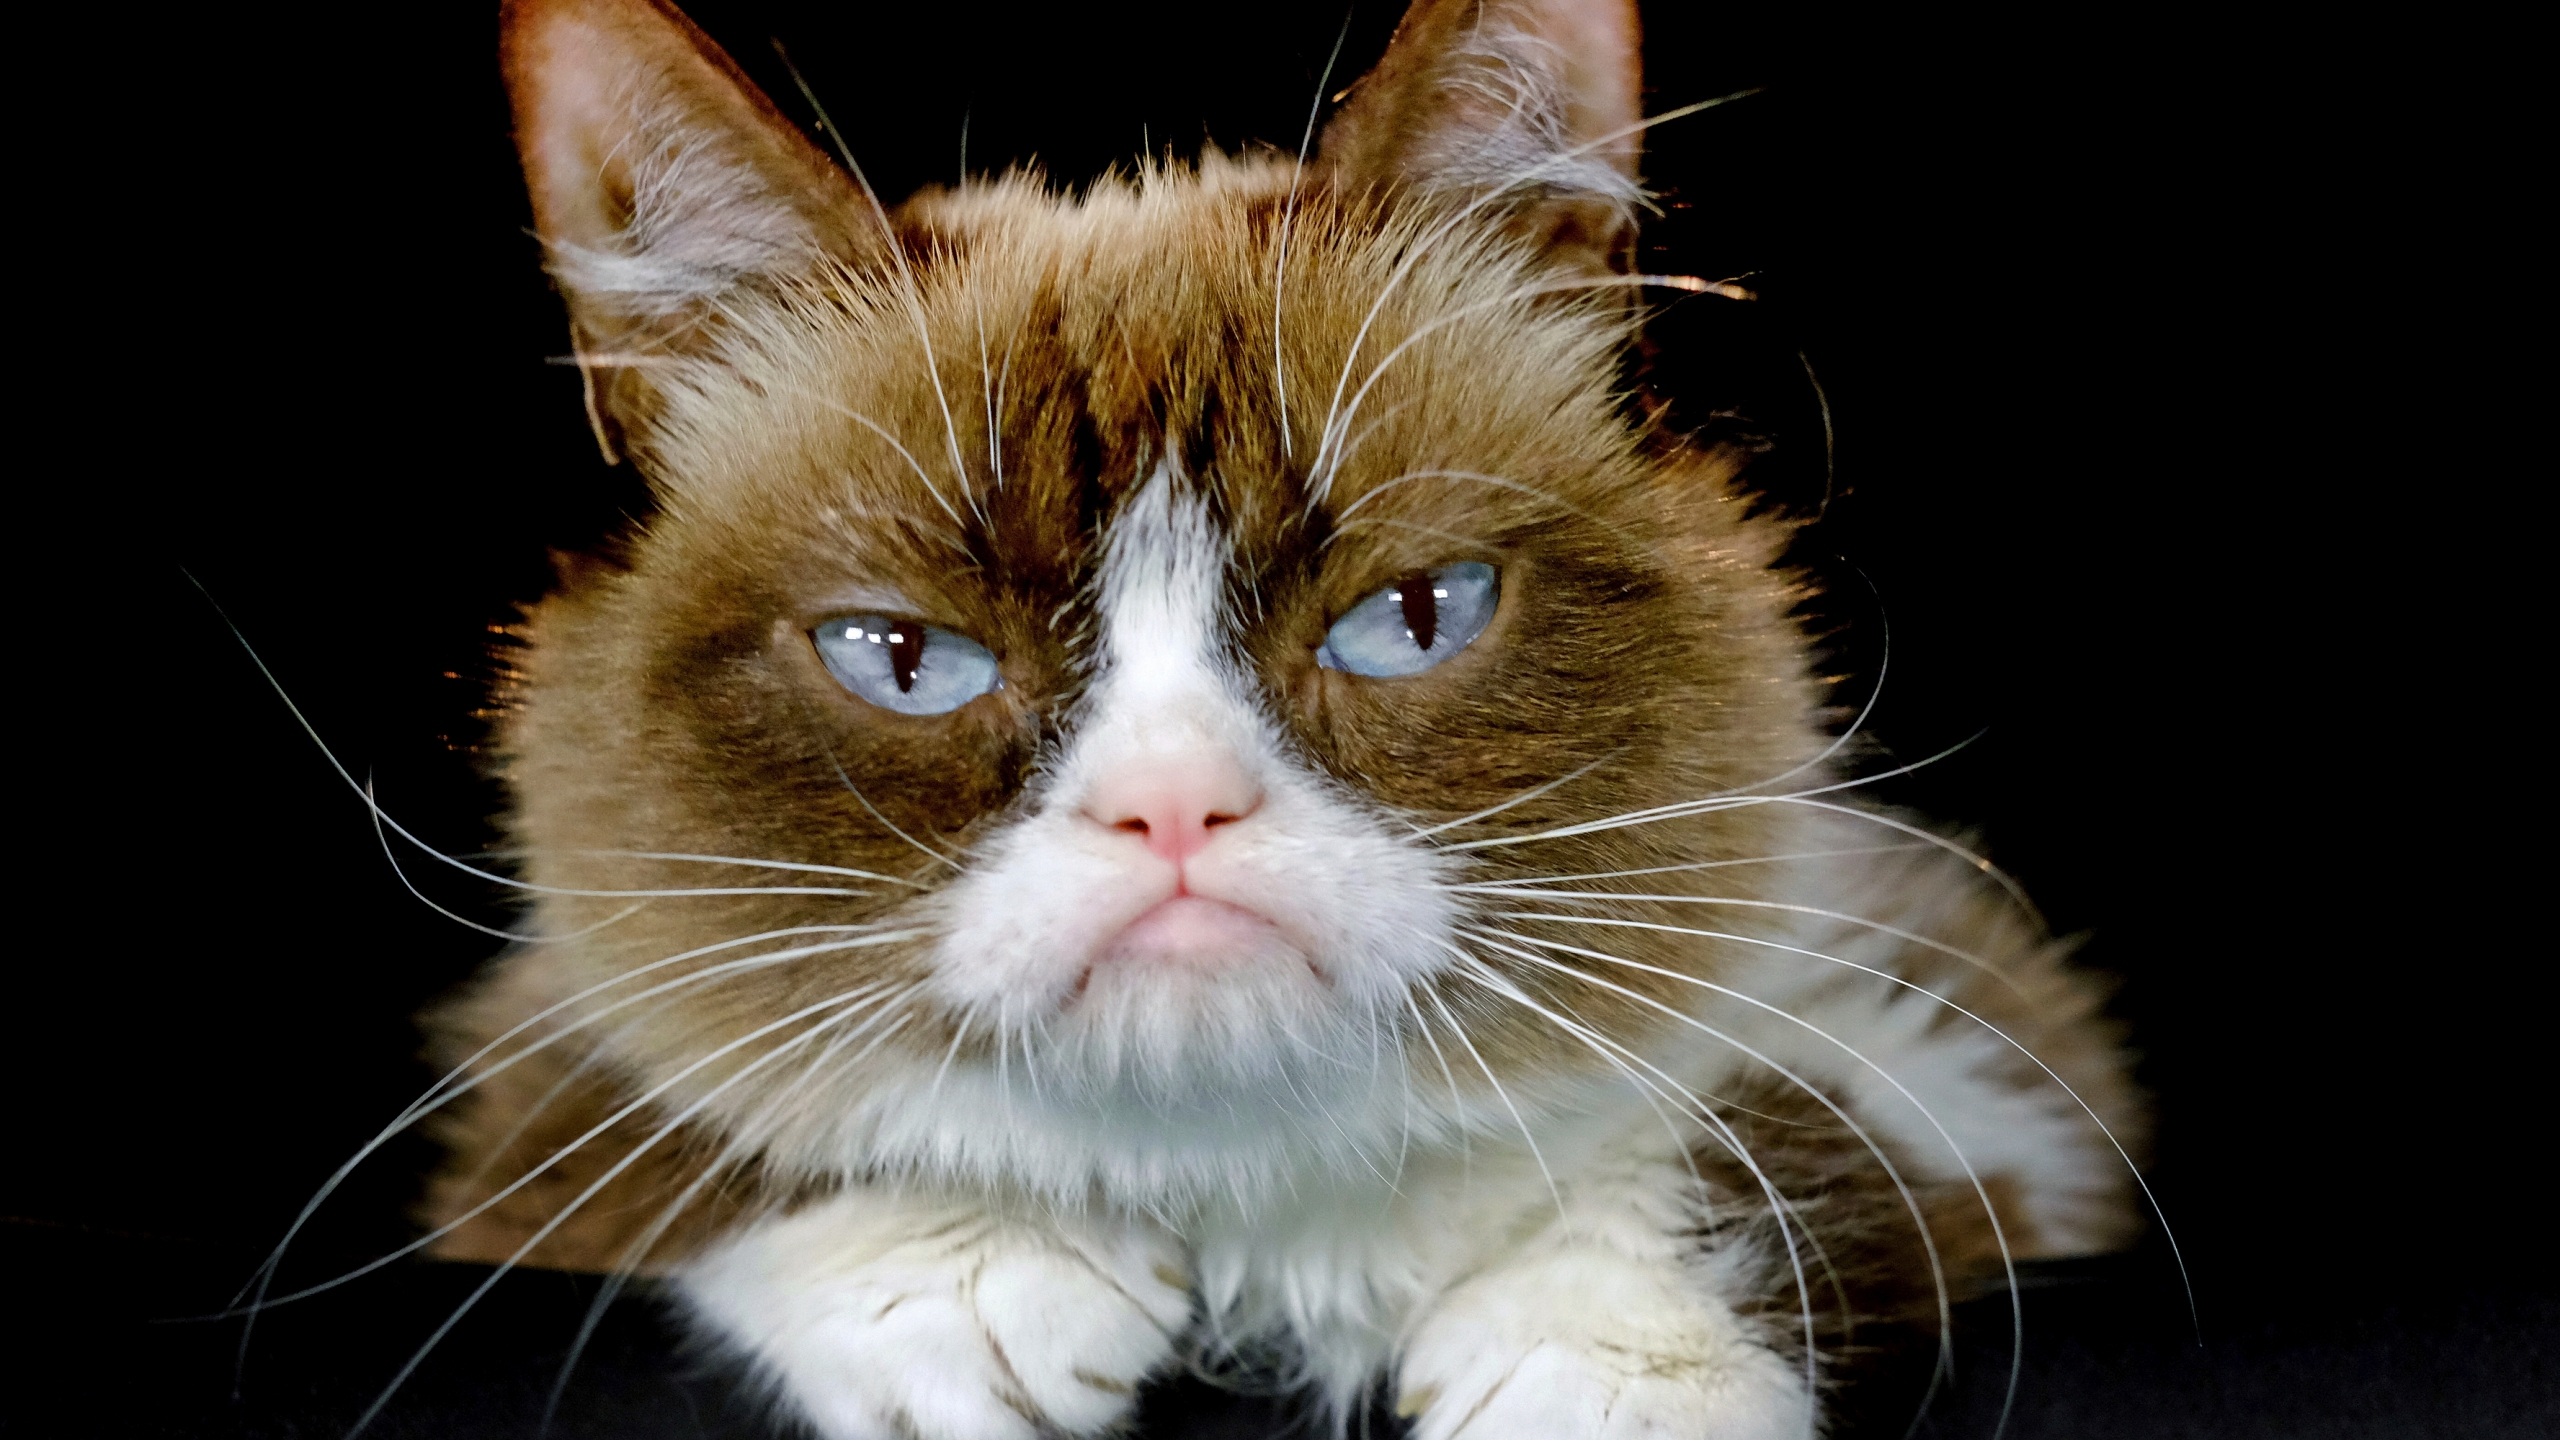 Grumpy_Cat_Death_23718-159532.jpg13697697